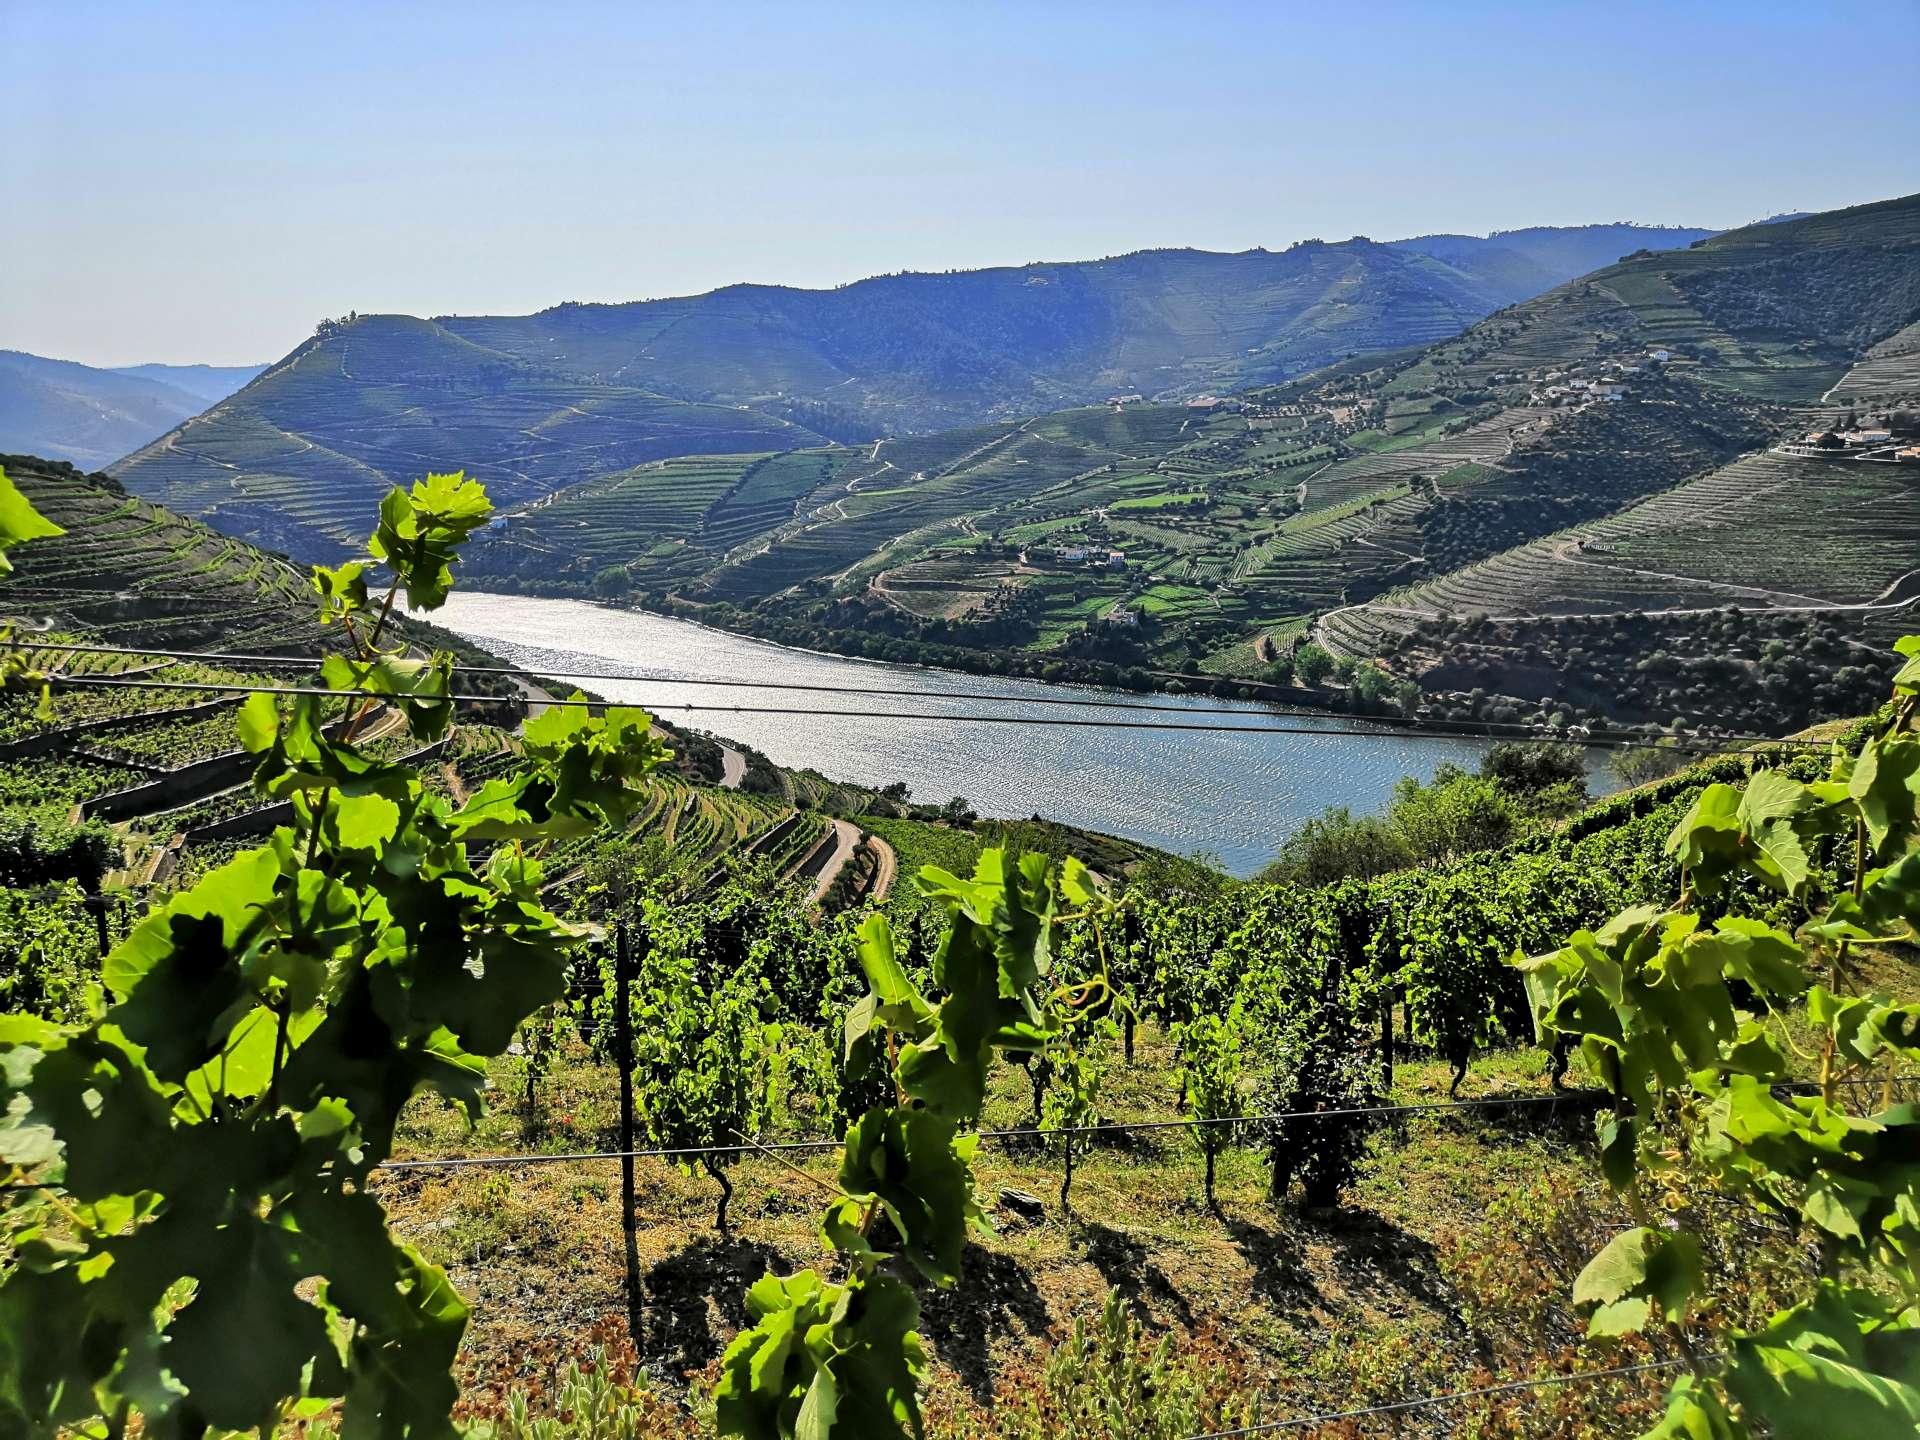 Podvečerní Douro z vinohradu v Quinta do Seixo.